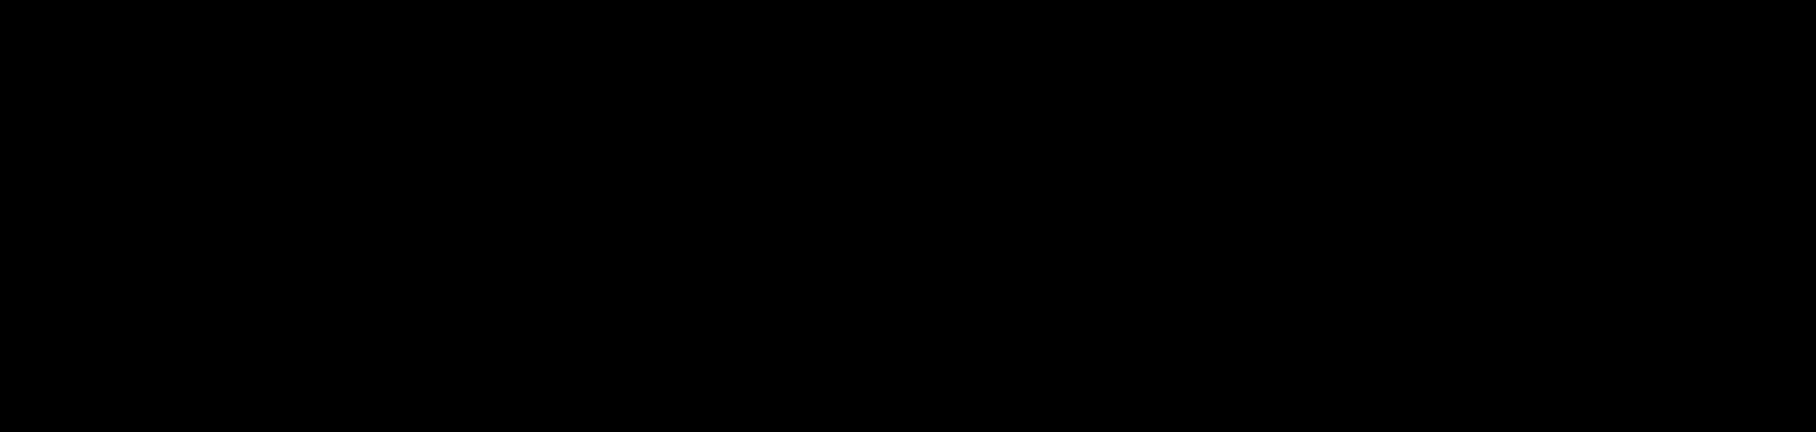 (R)-Pramipexole-d3 dihydrochloride